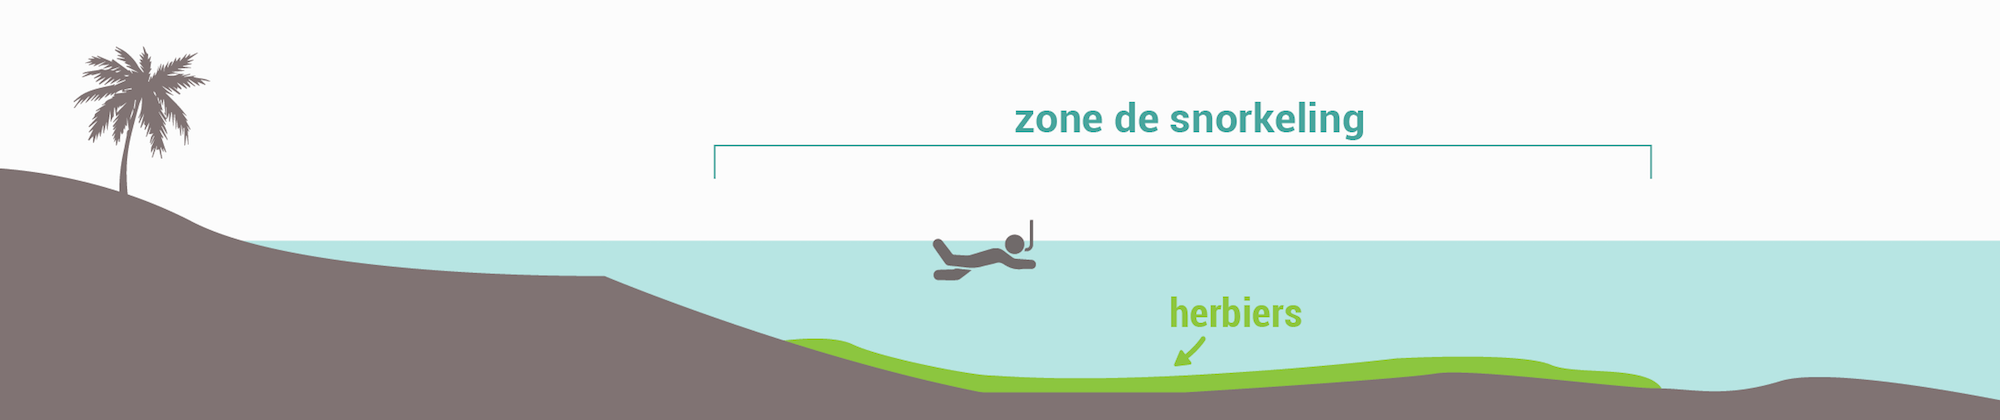 Les types de spots de snorkeling - Herbiers